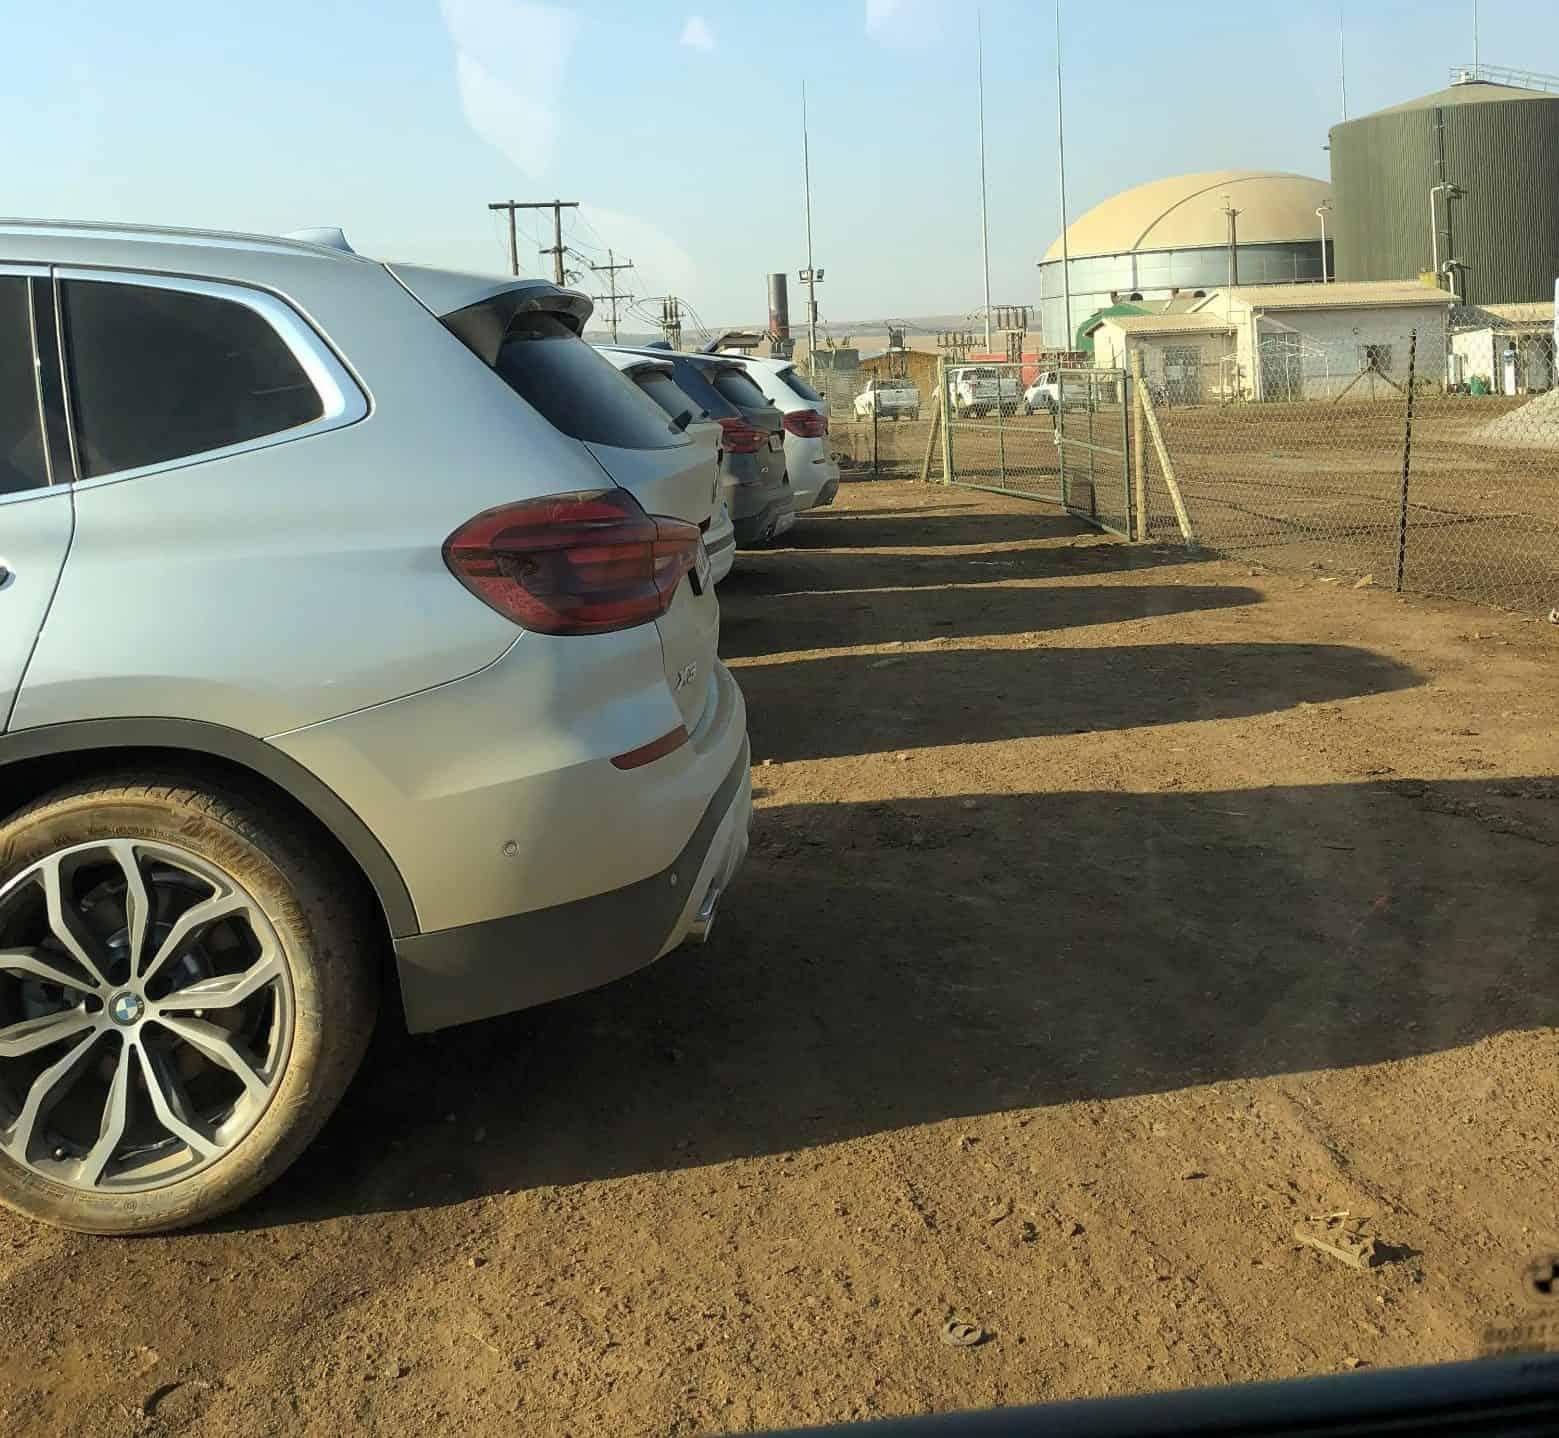 BMW X3 Werk in Rosslyn, Südafrika